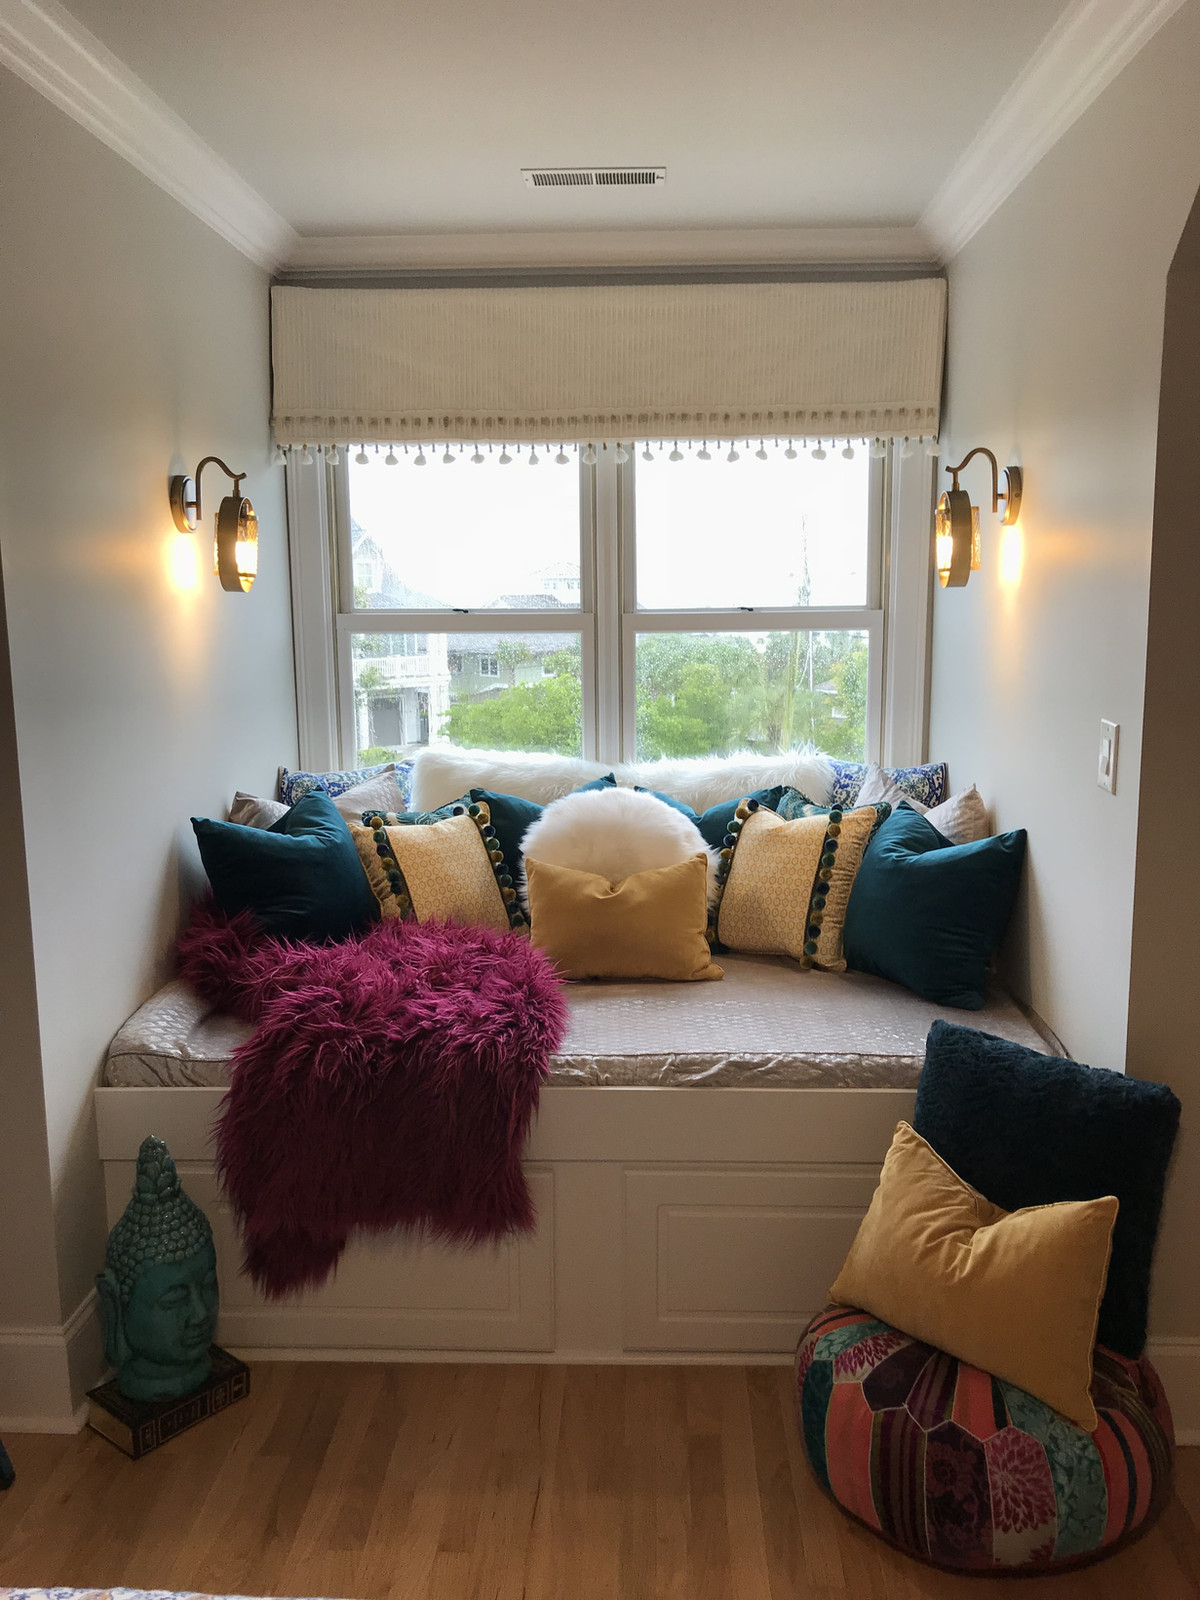 Coastal luxe interiors design myrtle beach sc - Interior design jobs myrtle beach sc ...